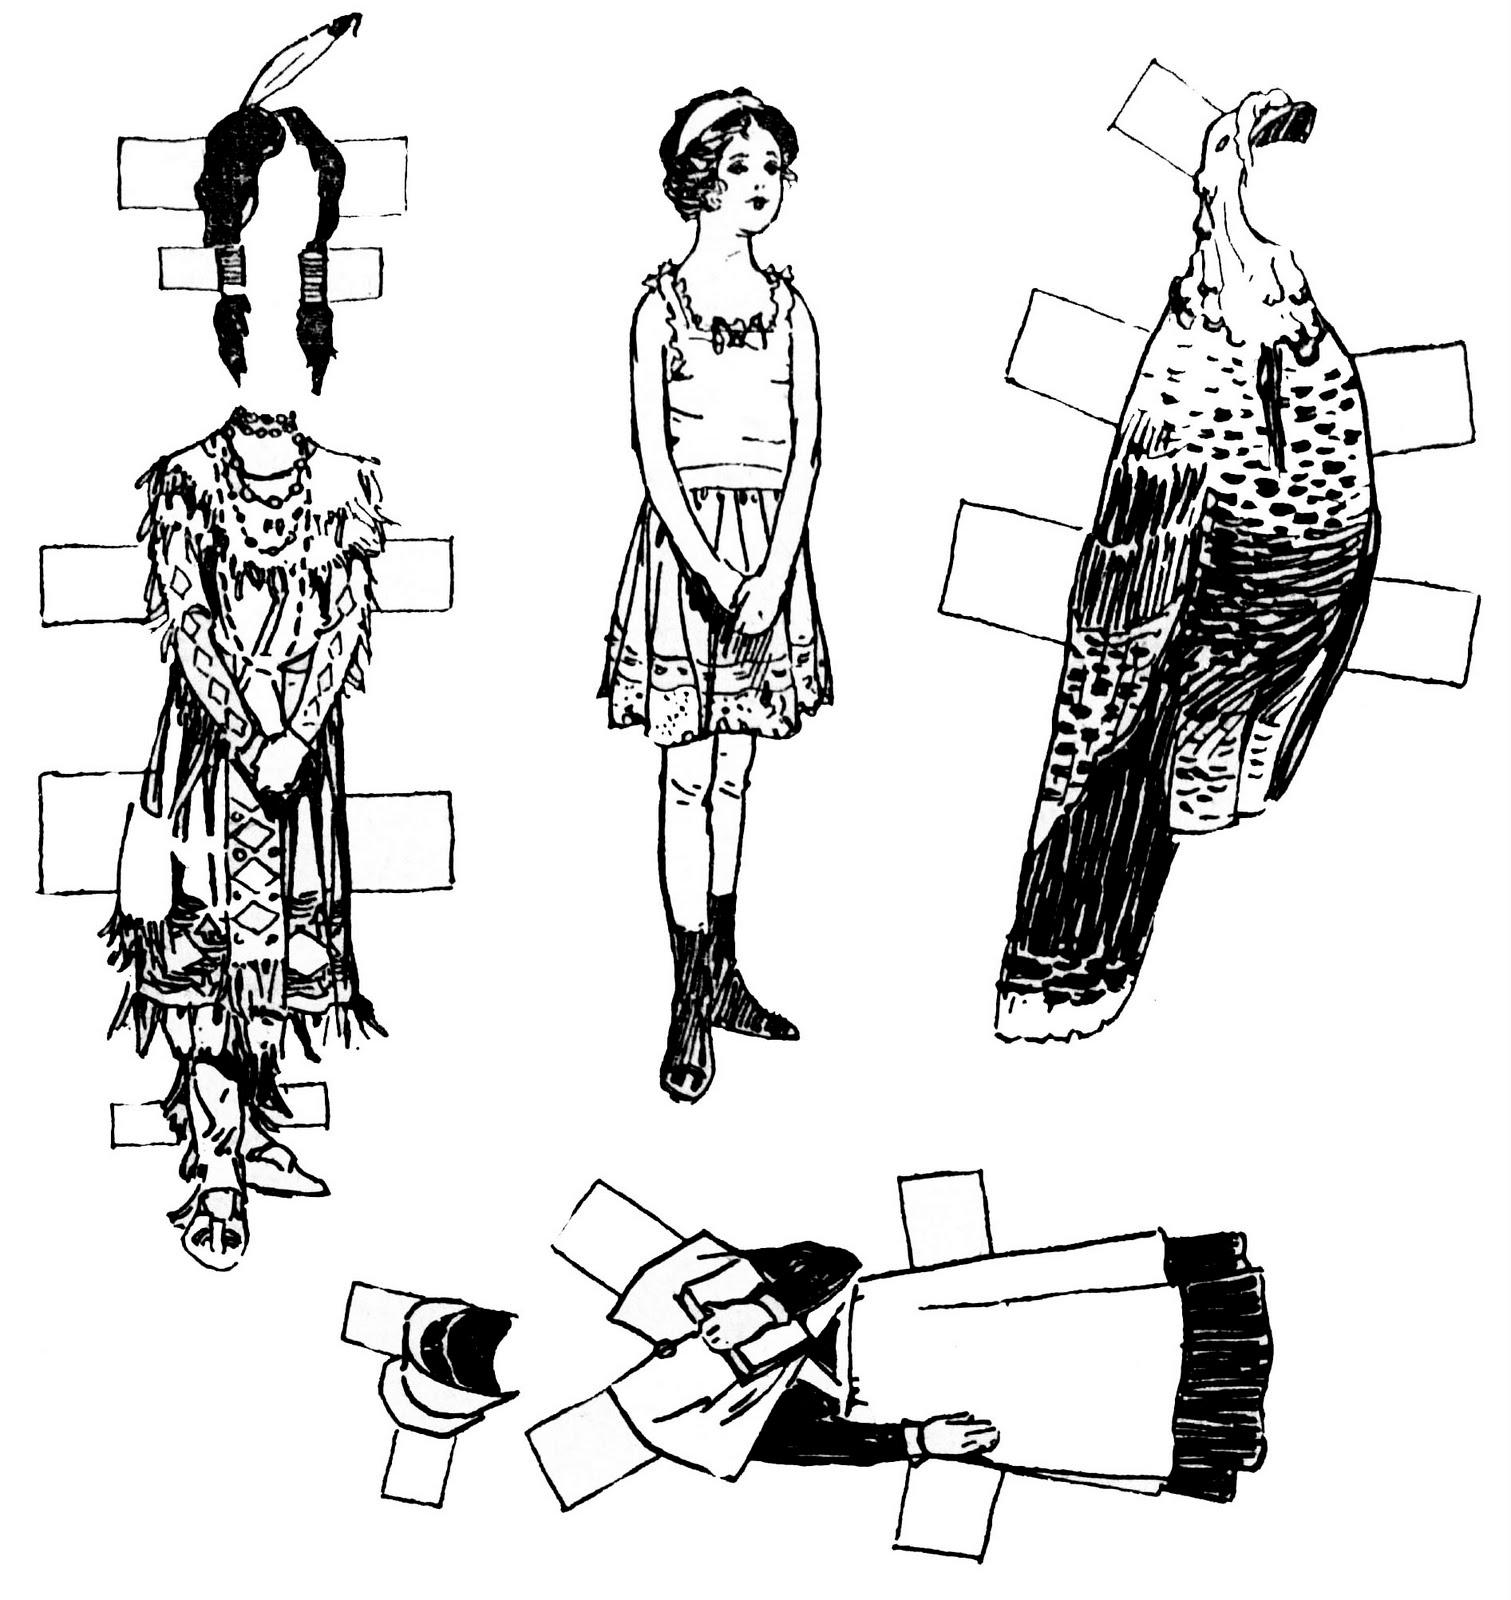 Vintage Kids Printable - Thanksgiving Paper Dolls - Cut And Color - Printable Paper Dolls To Color Free